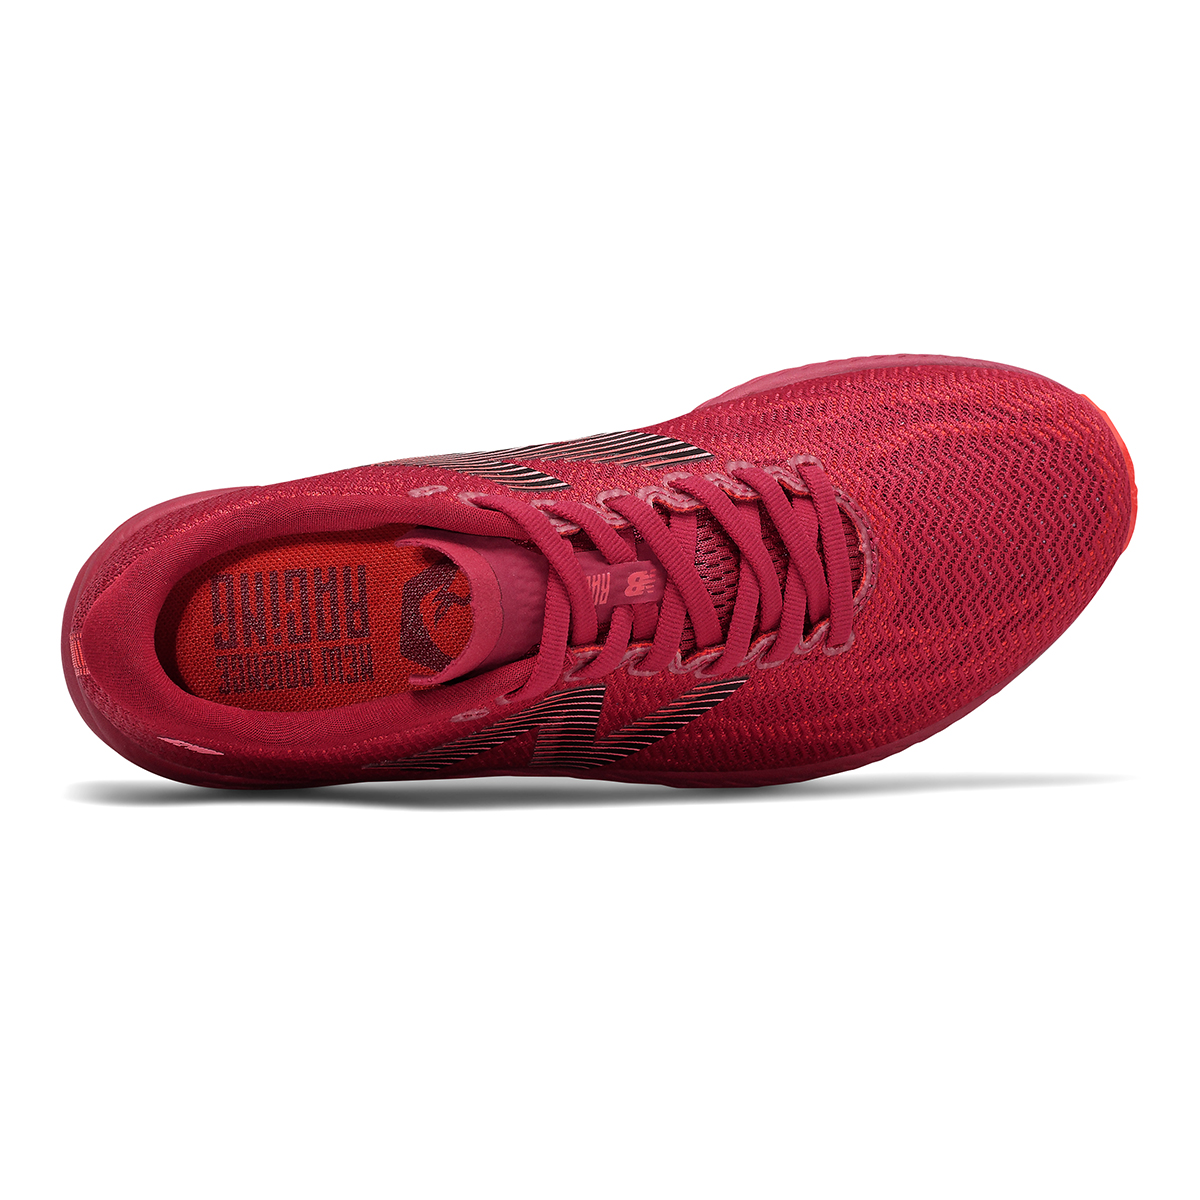 Women's New Balance 1400V6 Running Shoe - Color: Neo Crimson - Size: 5 - Width: Regular, Neo Crimson, large, image 2